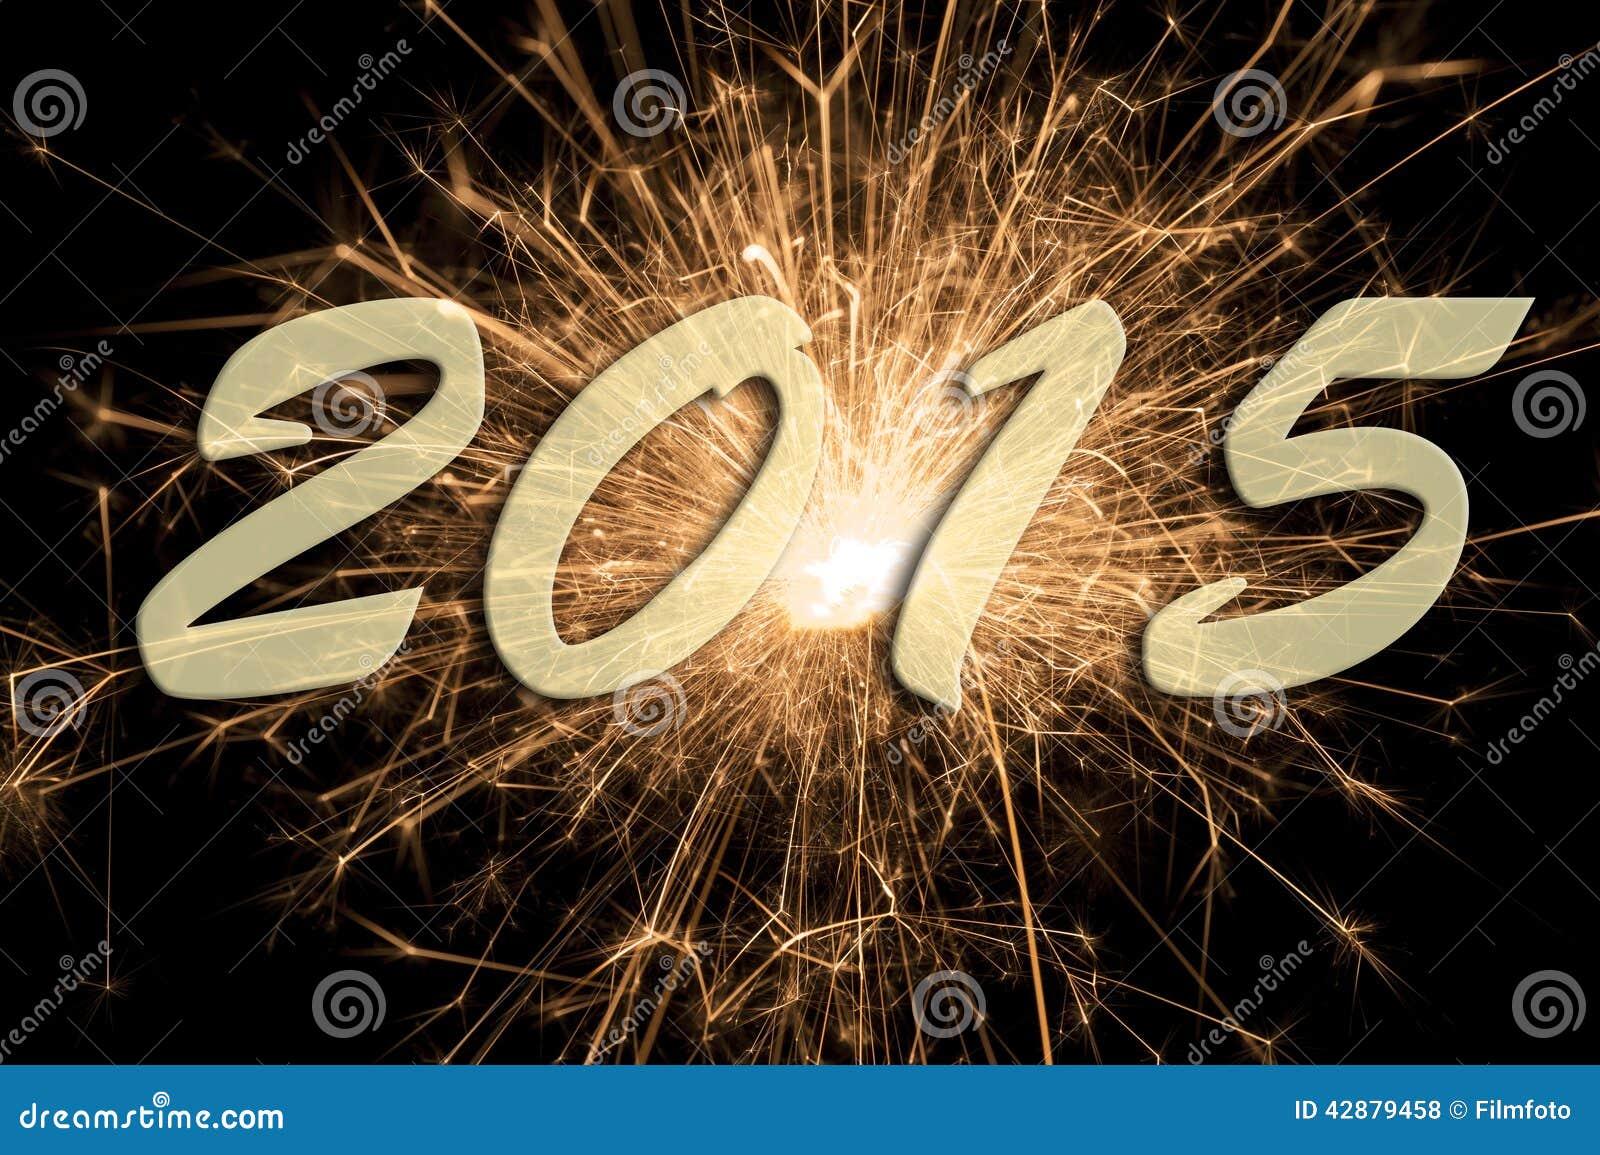 ♪♫♪QUE YA VIENE EL AÑOOOOO NUEVOOOOOOOOO ¡FELIZ AÑO NUEVO 2015!♪♫♪ - Página 2 Fuego-artificial-del-a%C3%B1o-nuevo-42879458